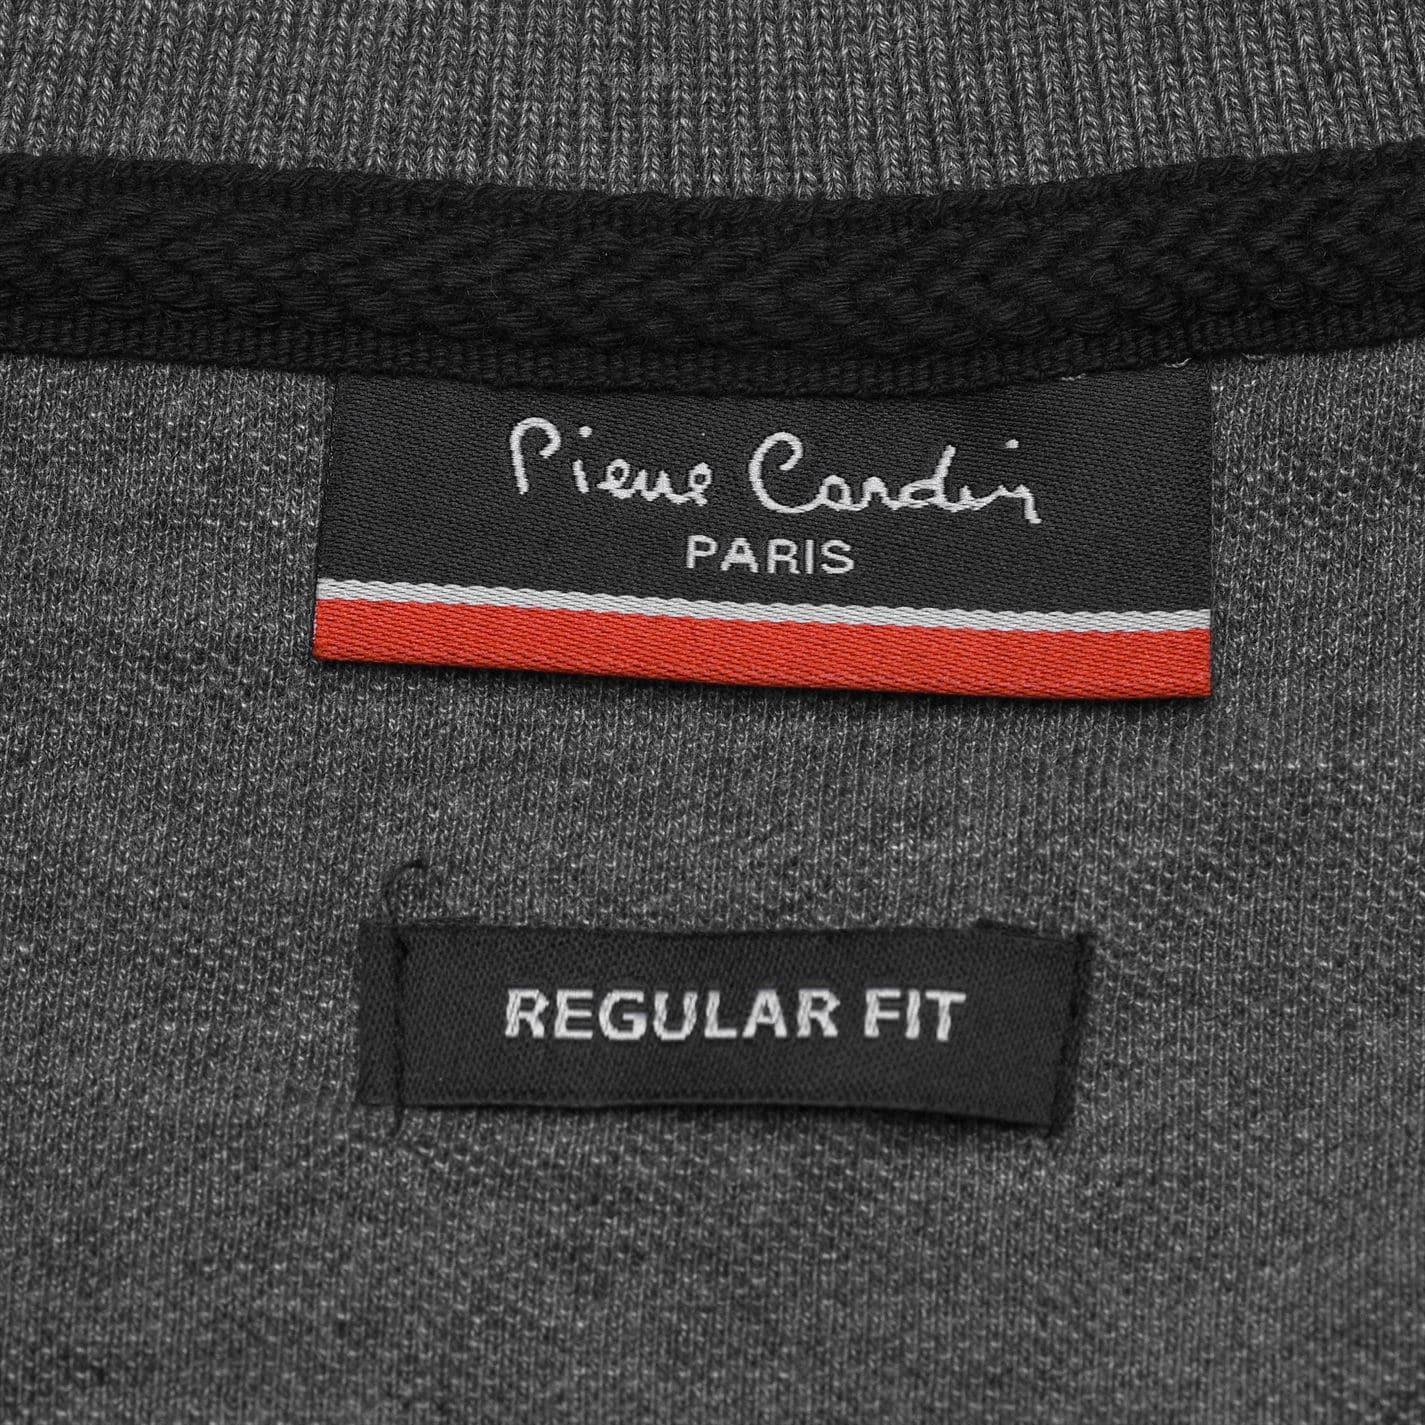 NEW-Pierre-Cardin-Mens-Long-Sleeve-Pure-Cotton-Polo-Shirt-Size-S-M-L-XL-XXL thumbnail 18